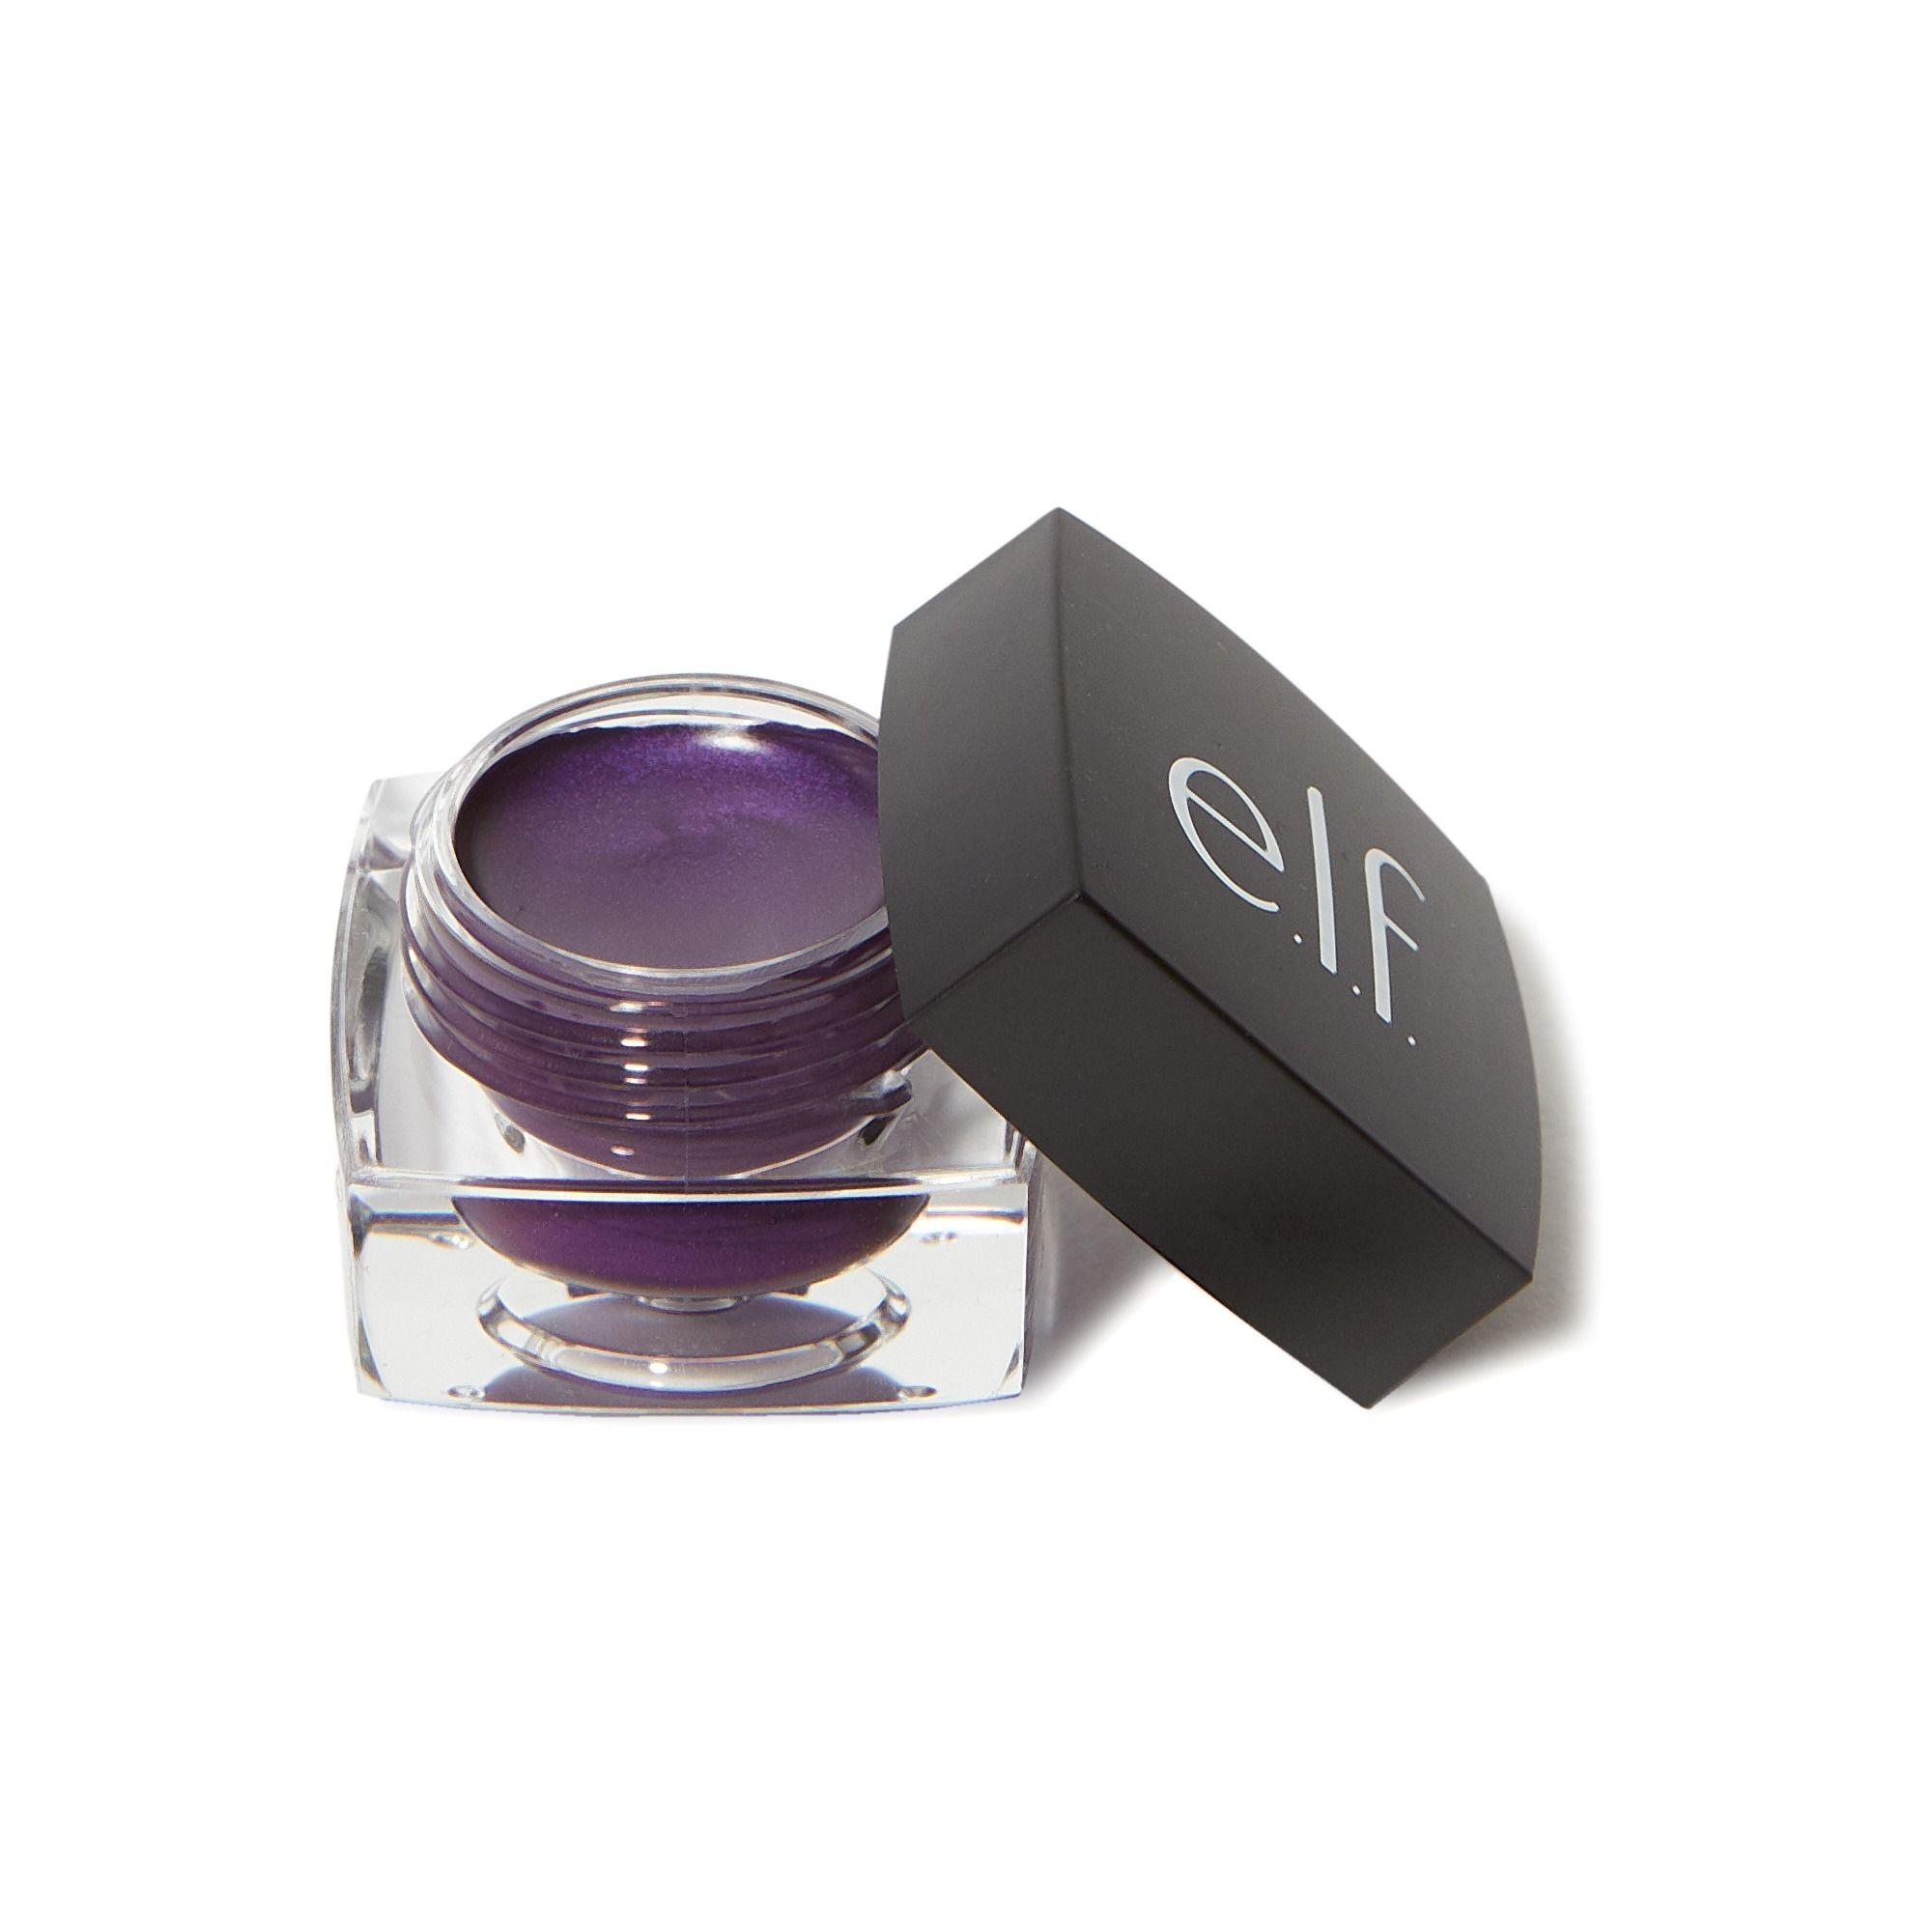 e.l.f. Cosmetics Cream Eyeliner